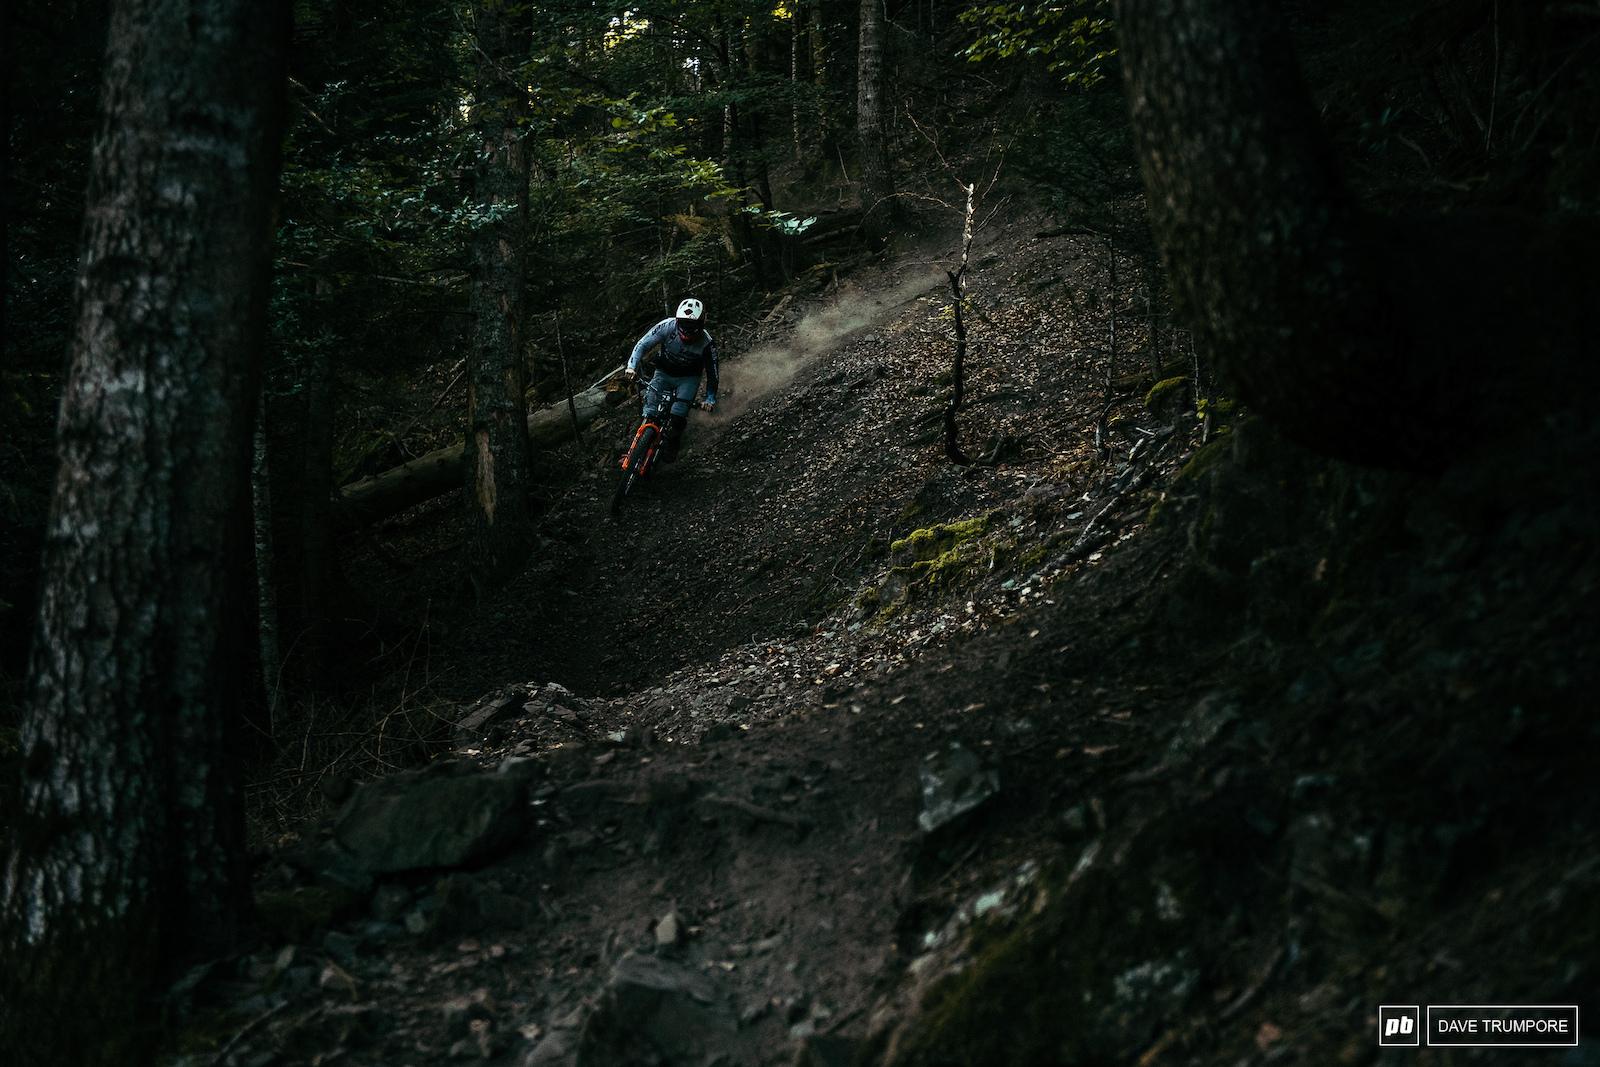 Keagan Wright through the dark forest